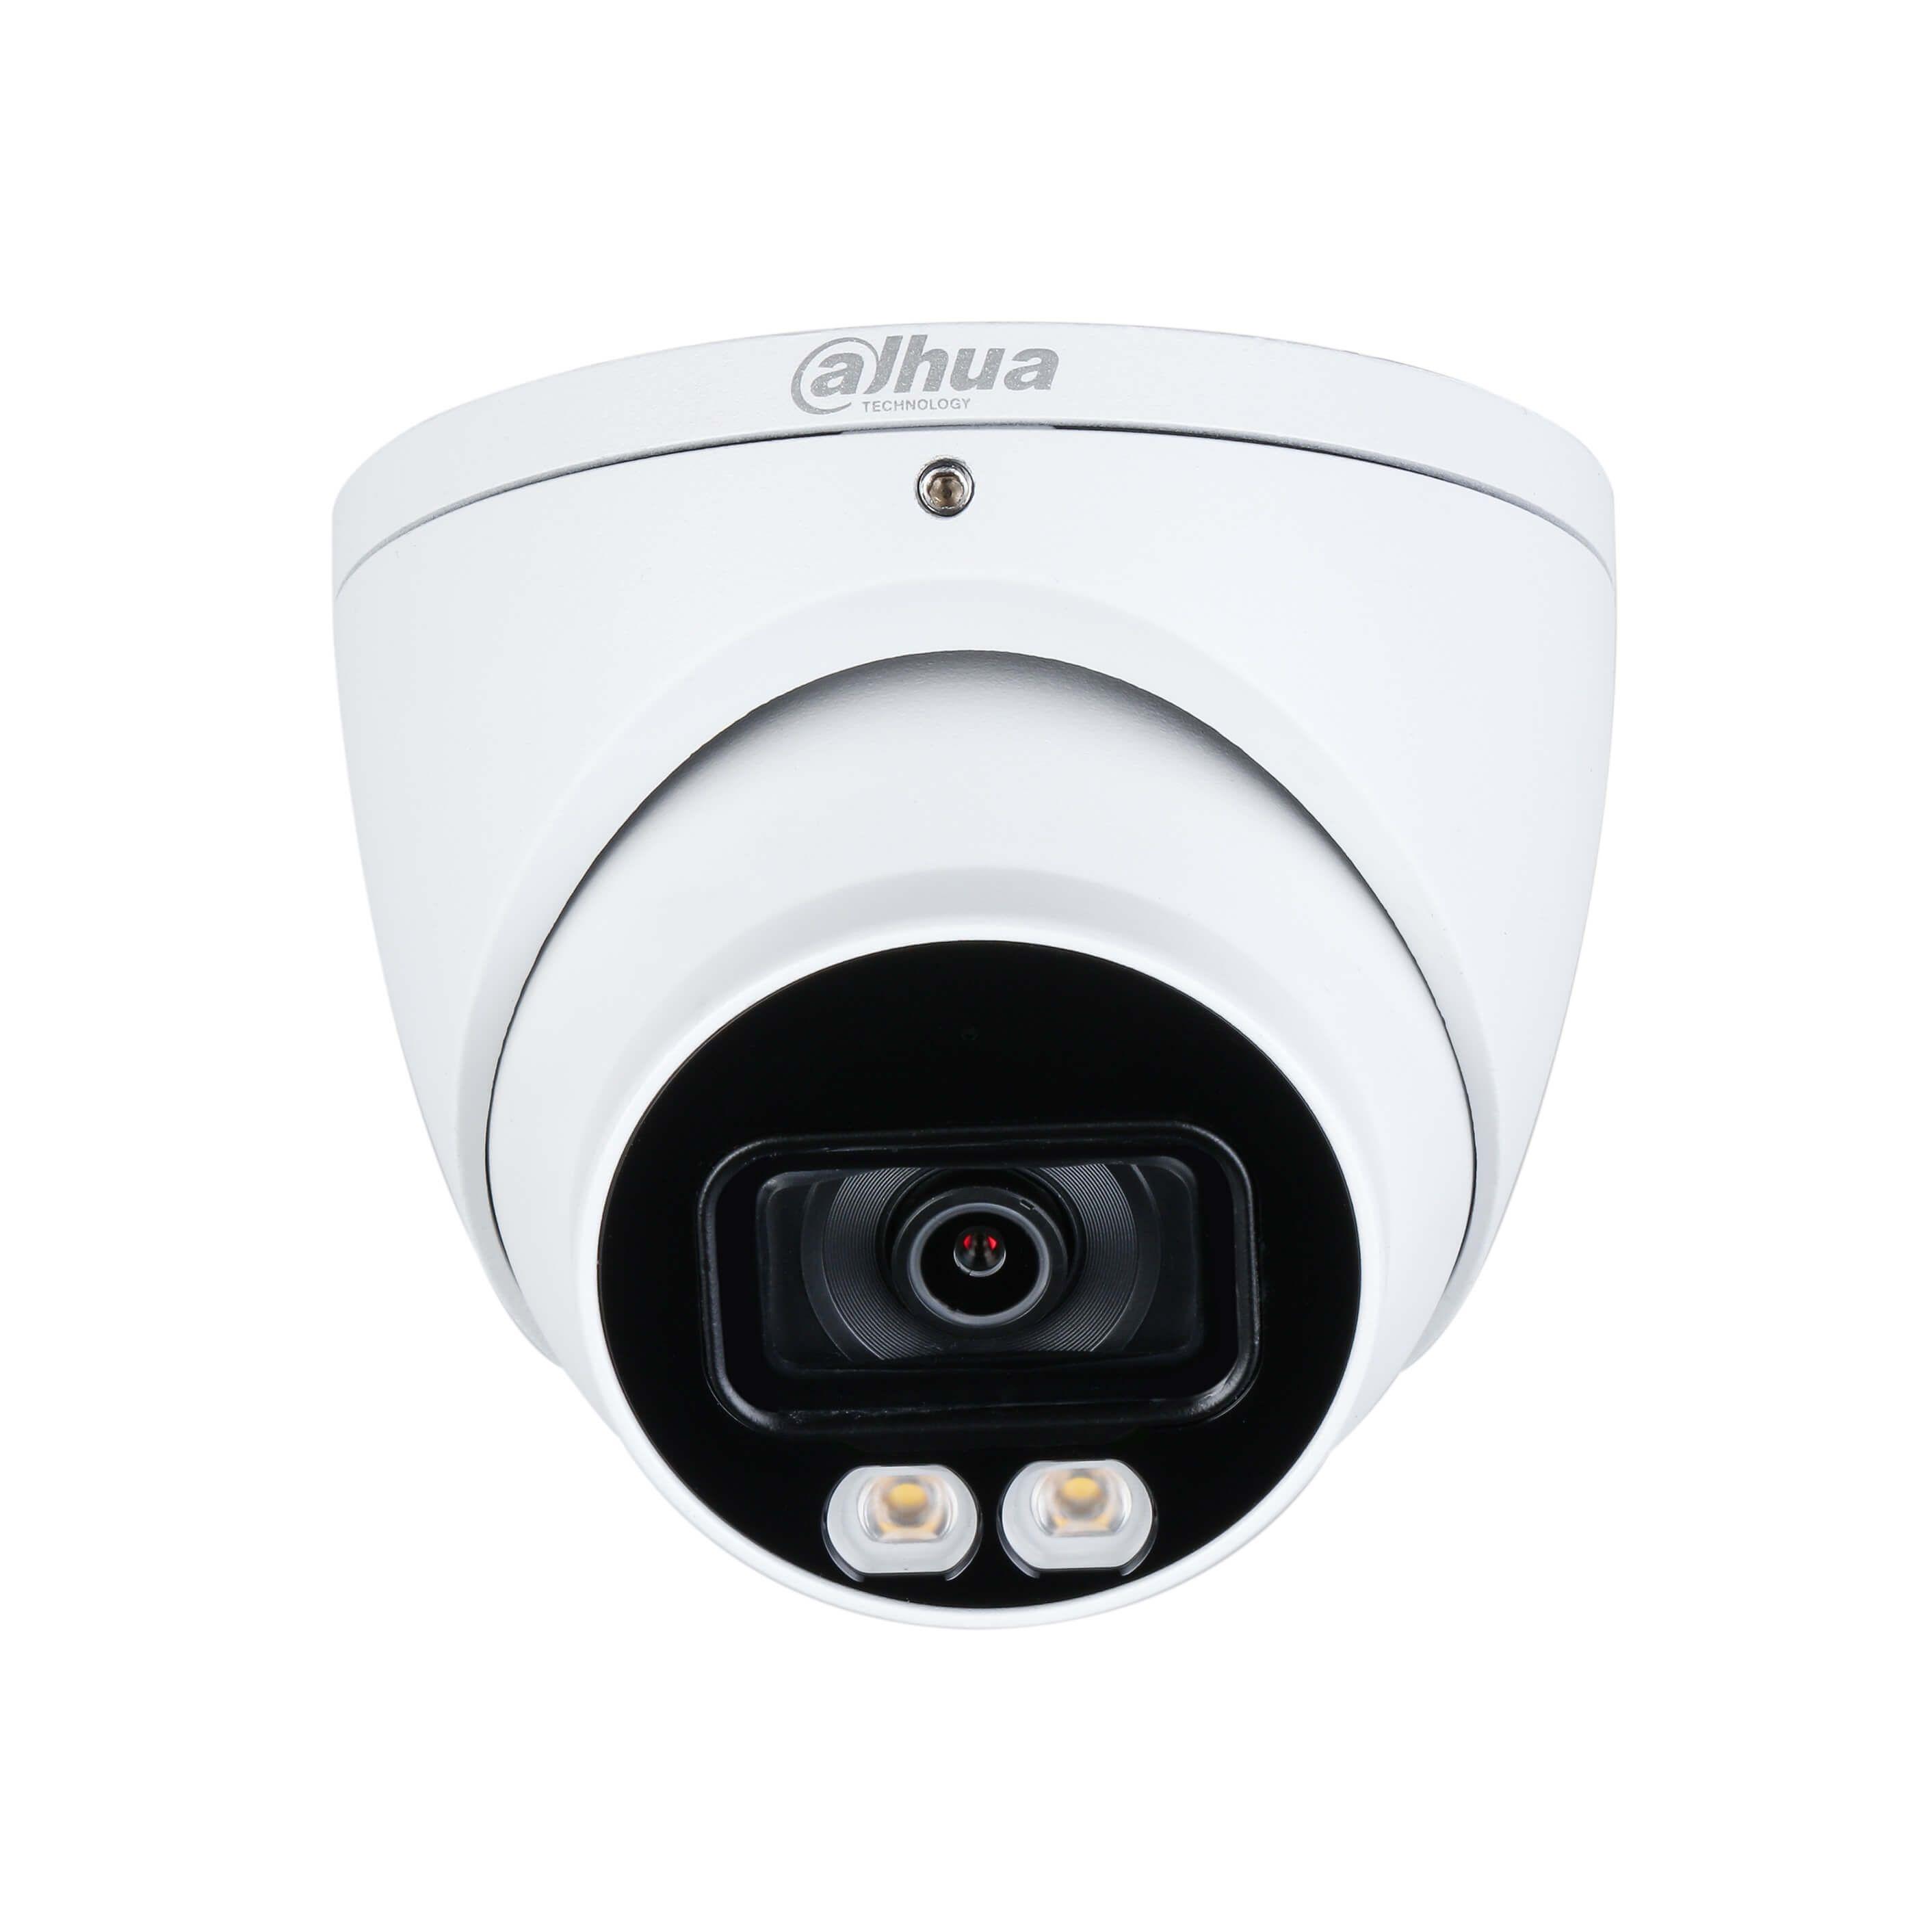 Camera Dahua DH-HAC-HDW1509TP-A-LED